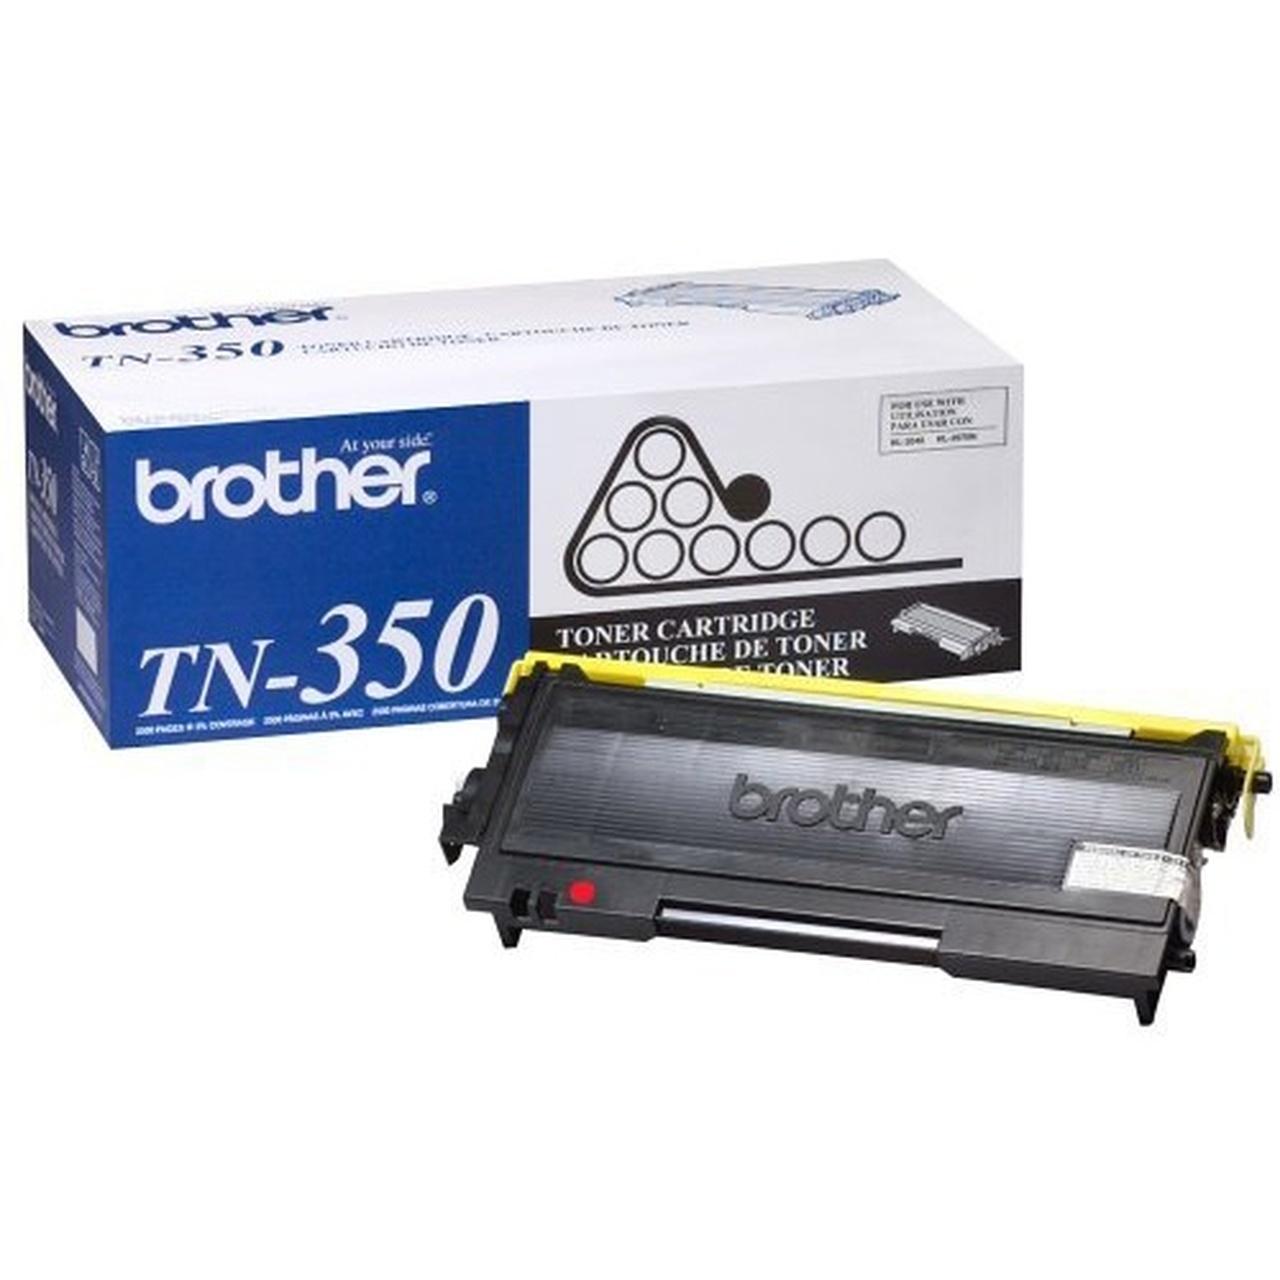 Toner Brother Original - TN-350